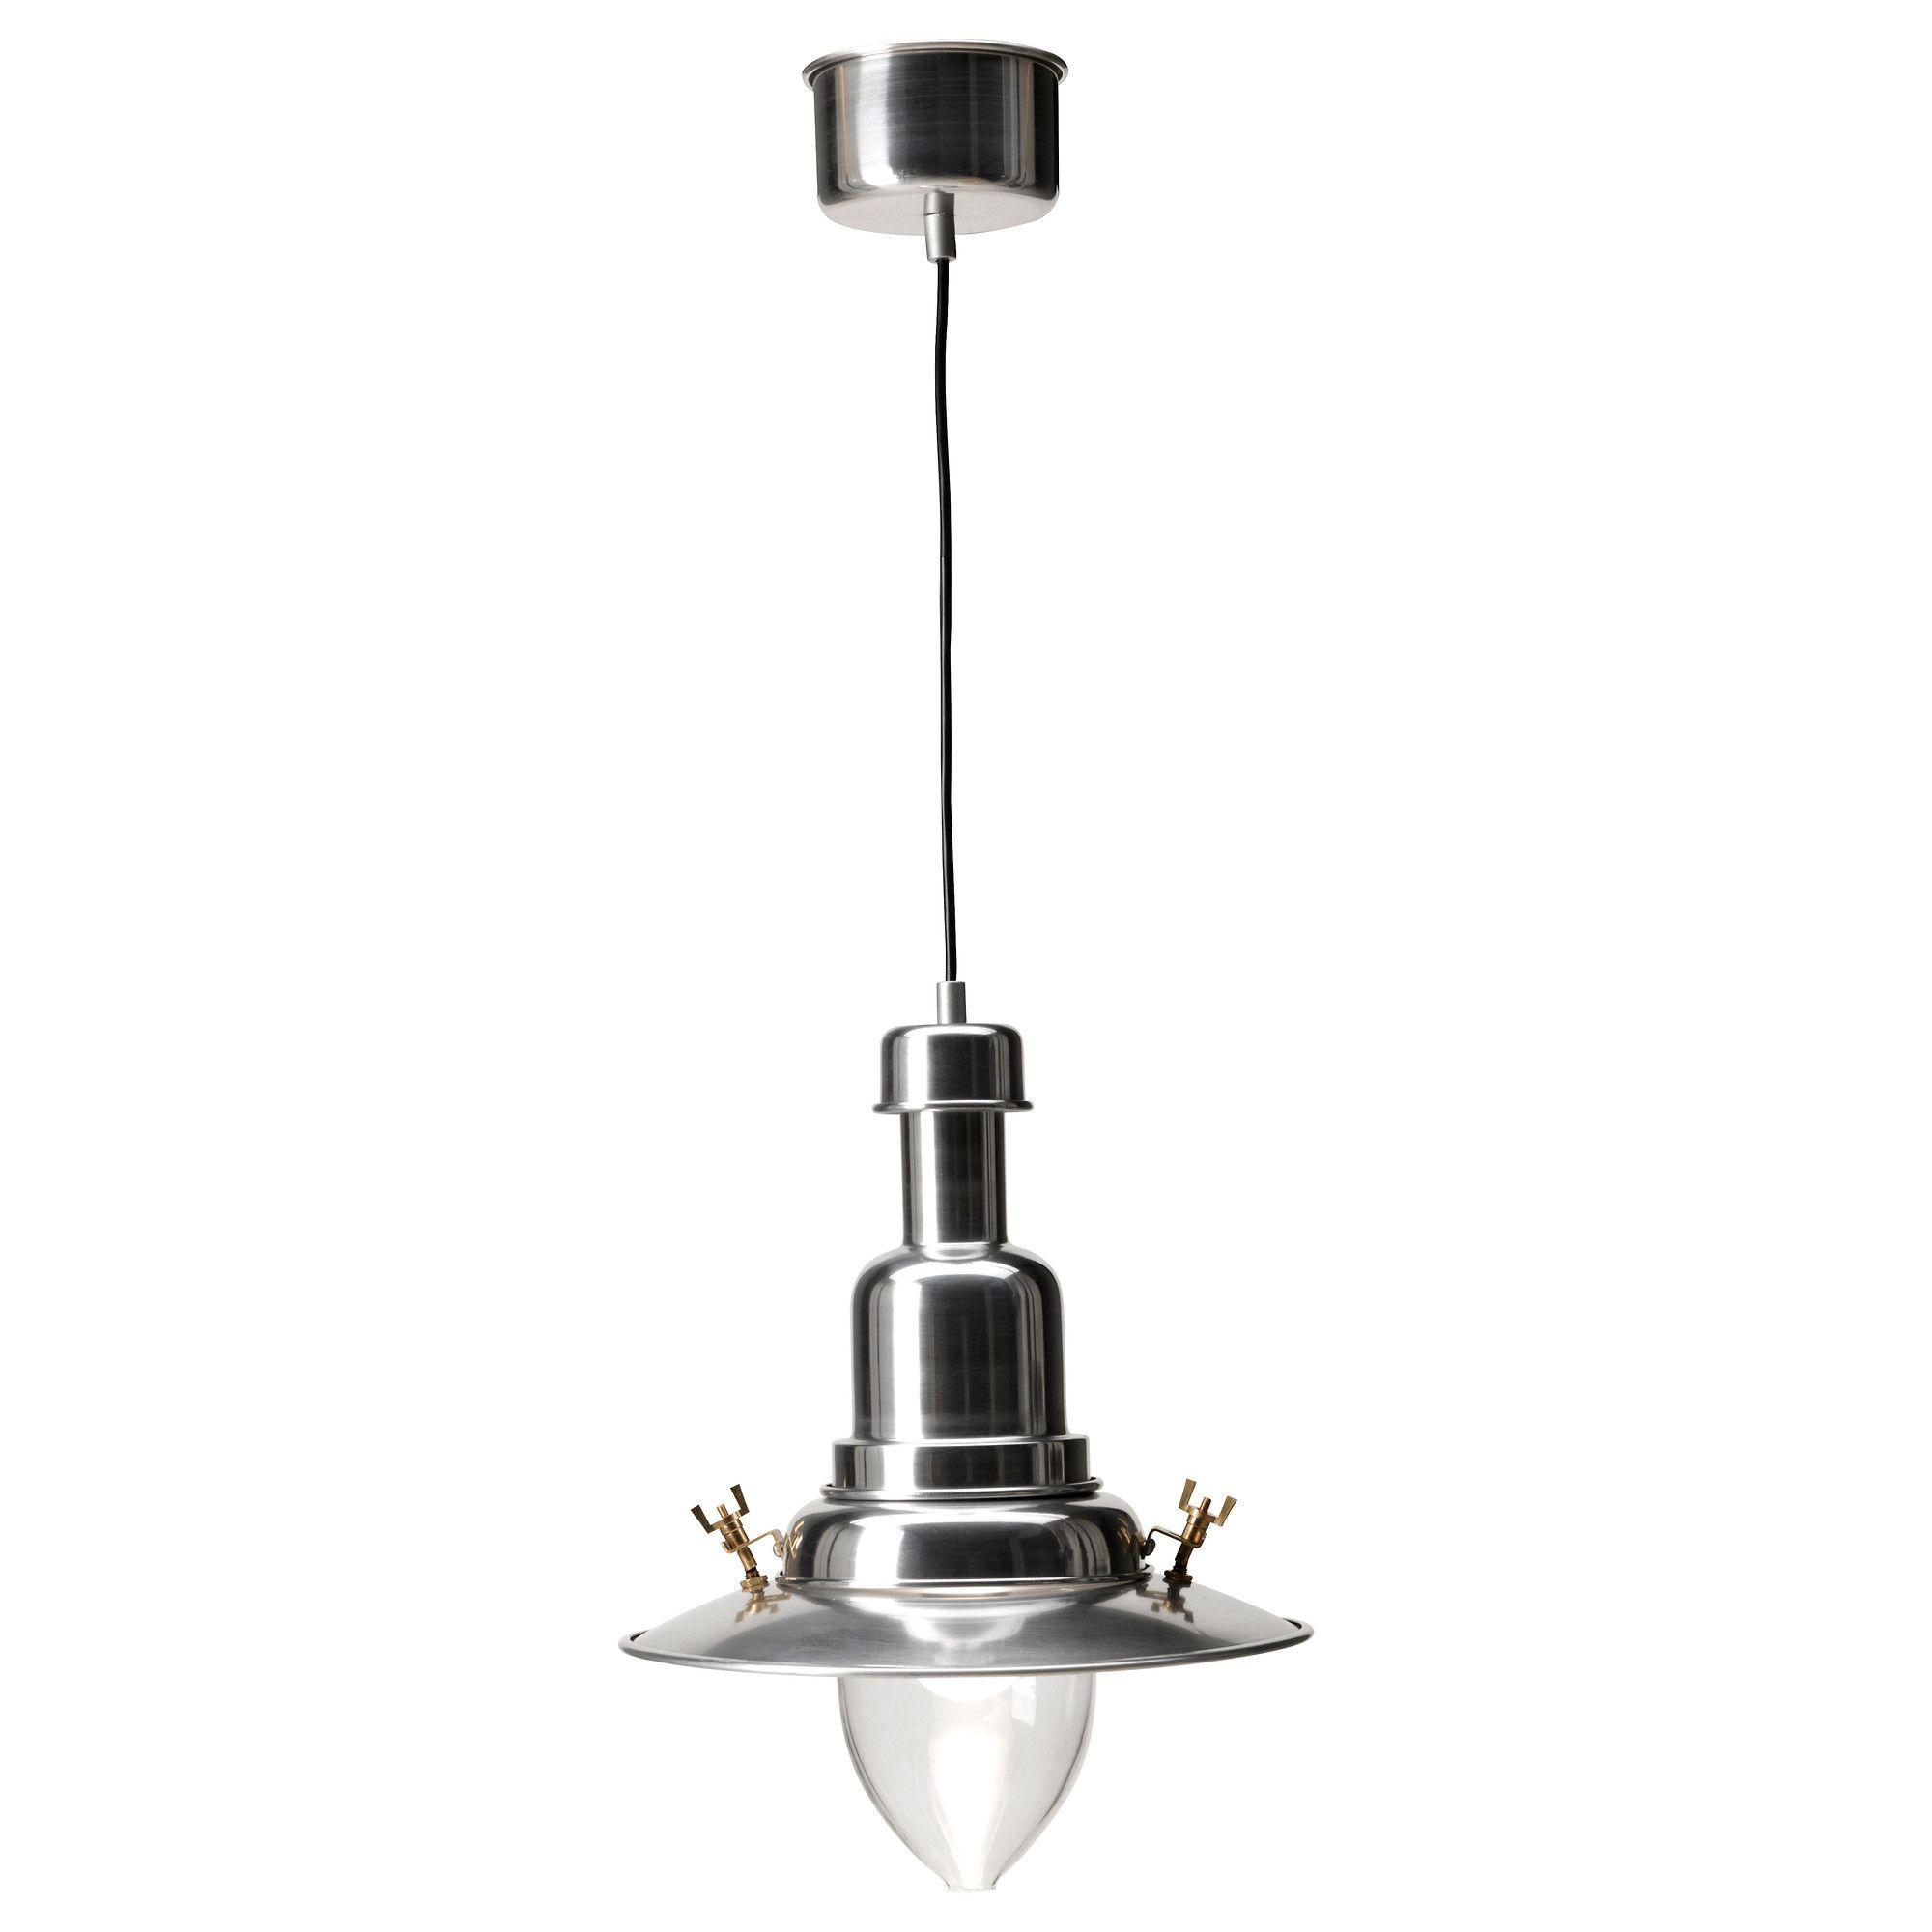 Lampadari Da Camera Matrimoniale Ikea ottava lampada a sospensione - alluminio | lampade a